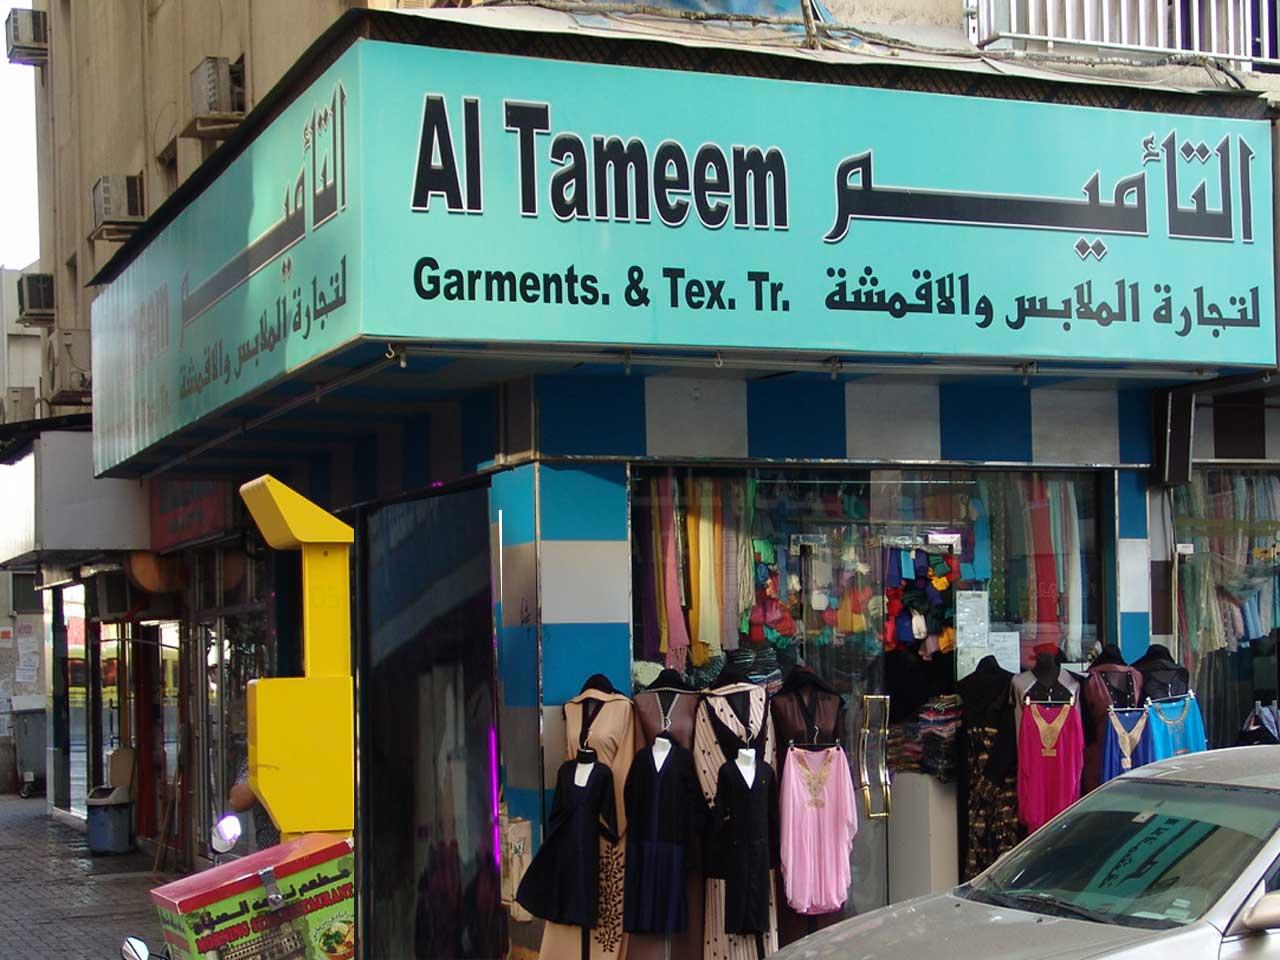 Al Tameem Abaya Gar & Textiles Trading - DSC03731.jpg